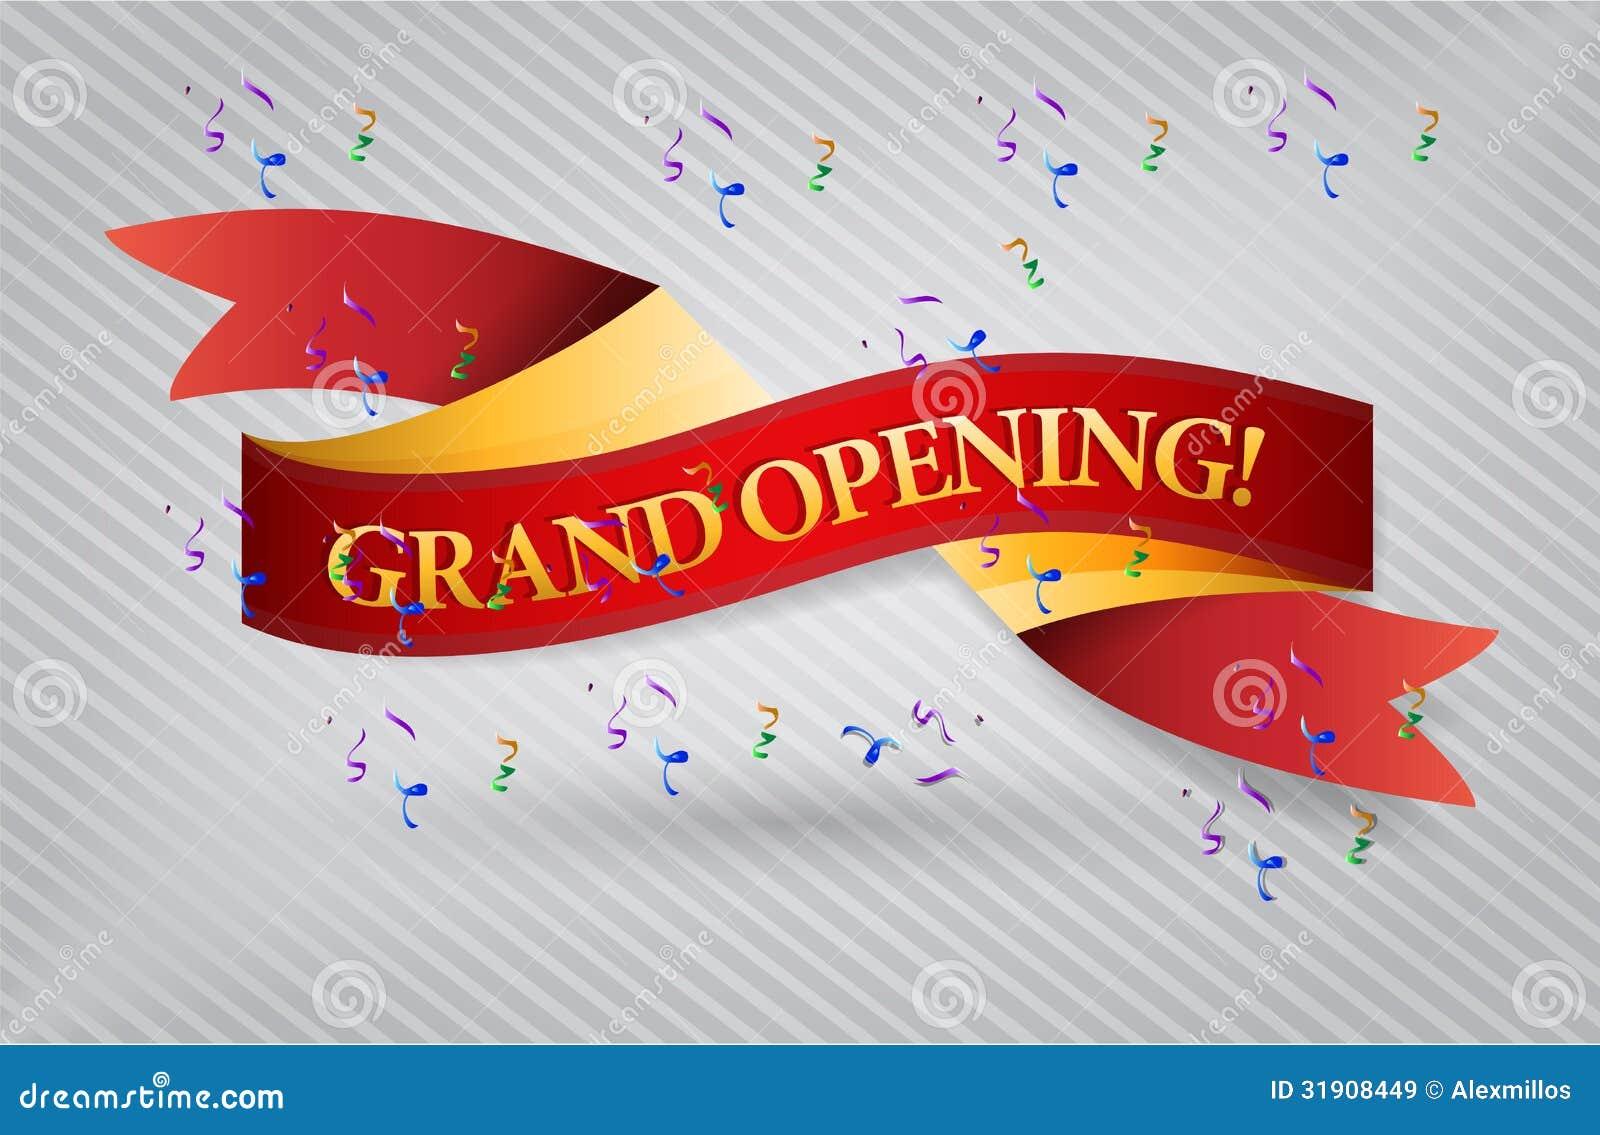 grand opening red waving ribbon banner royalty free stock photo